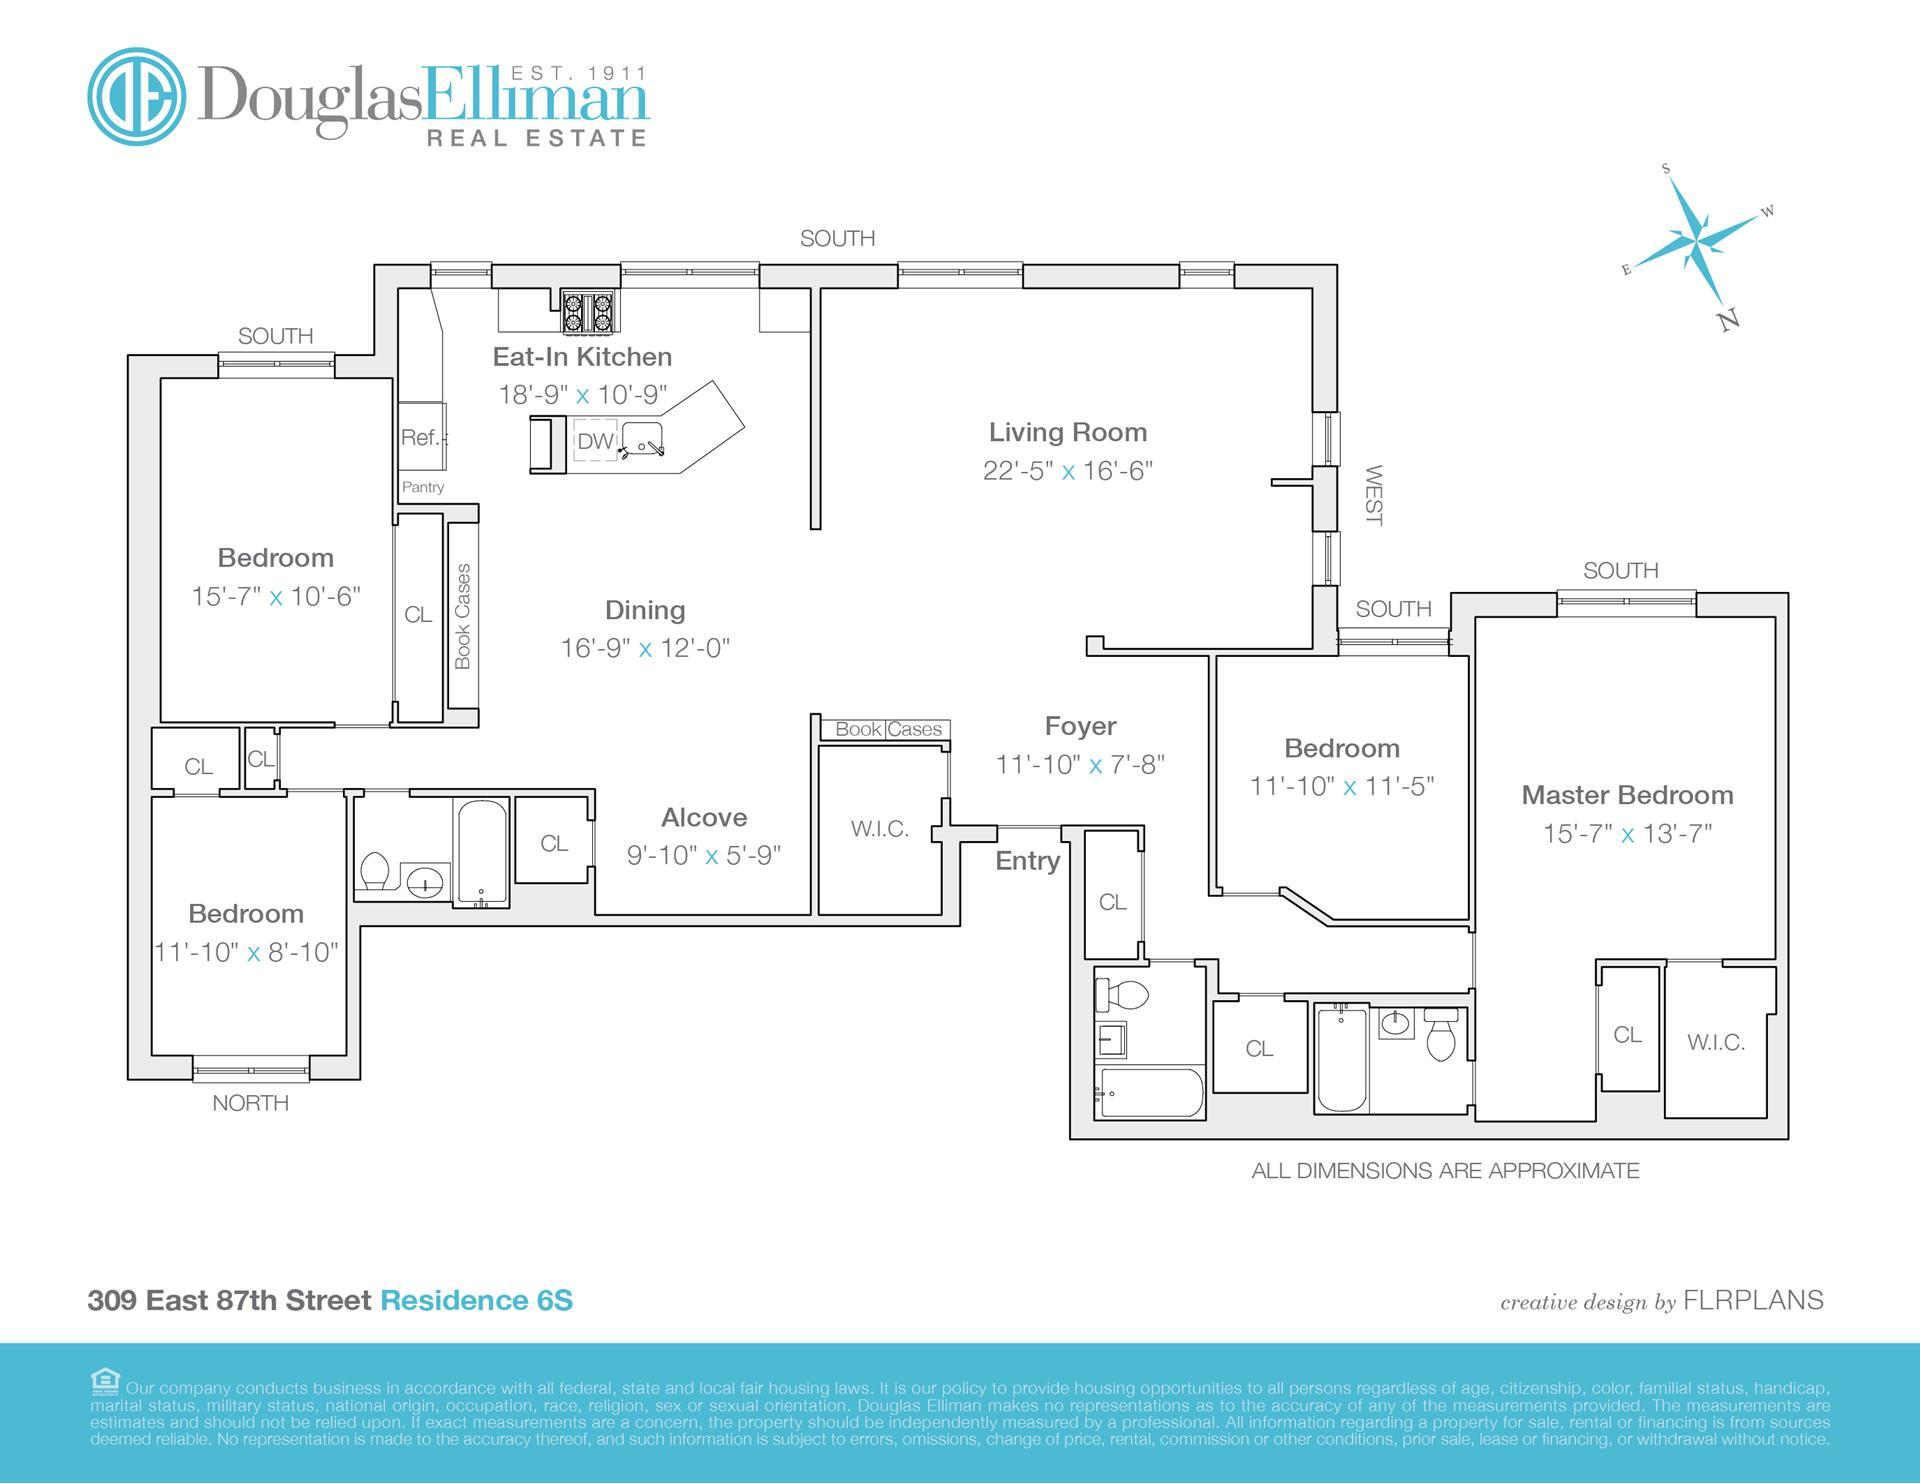 Floor plan of 309 East 87th St, 6PRS - Upper East Side, New York